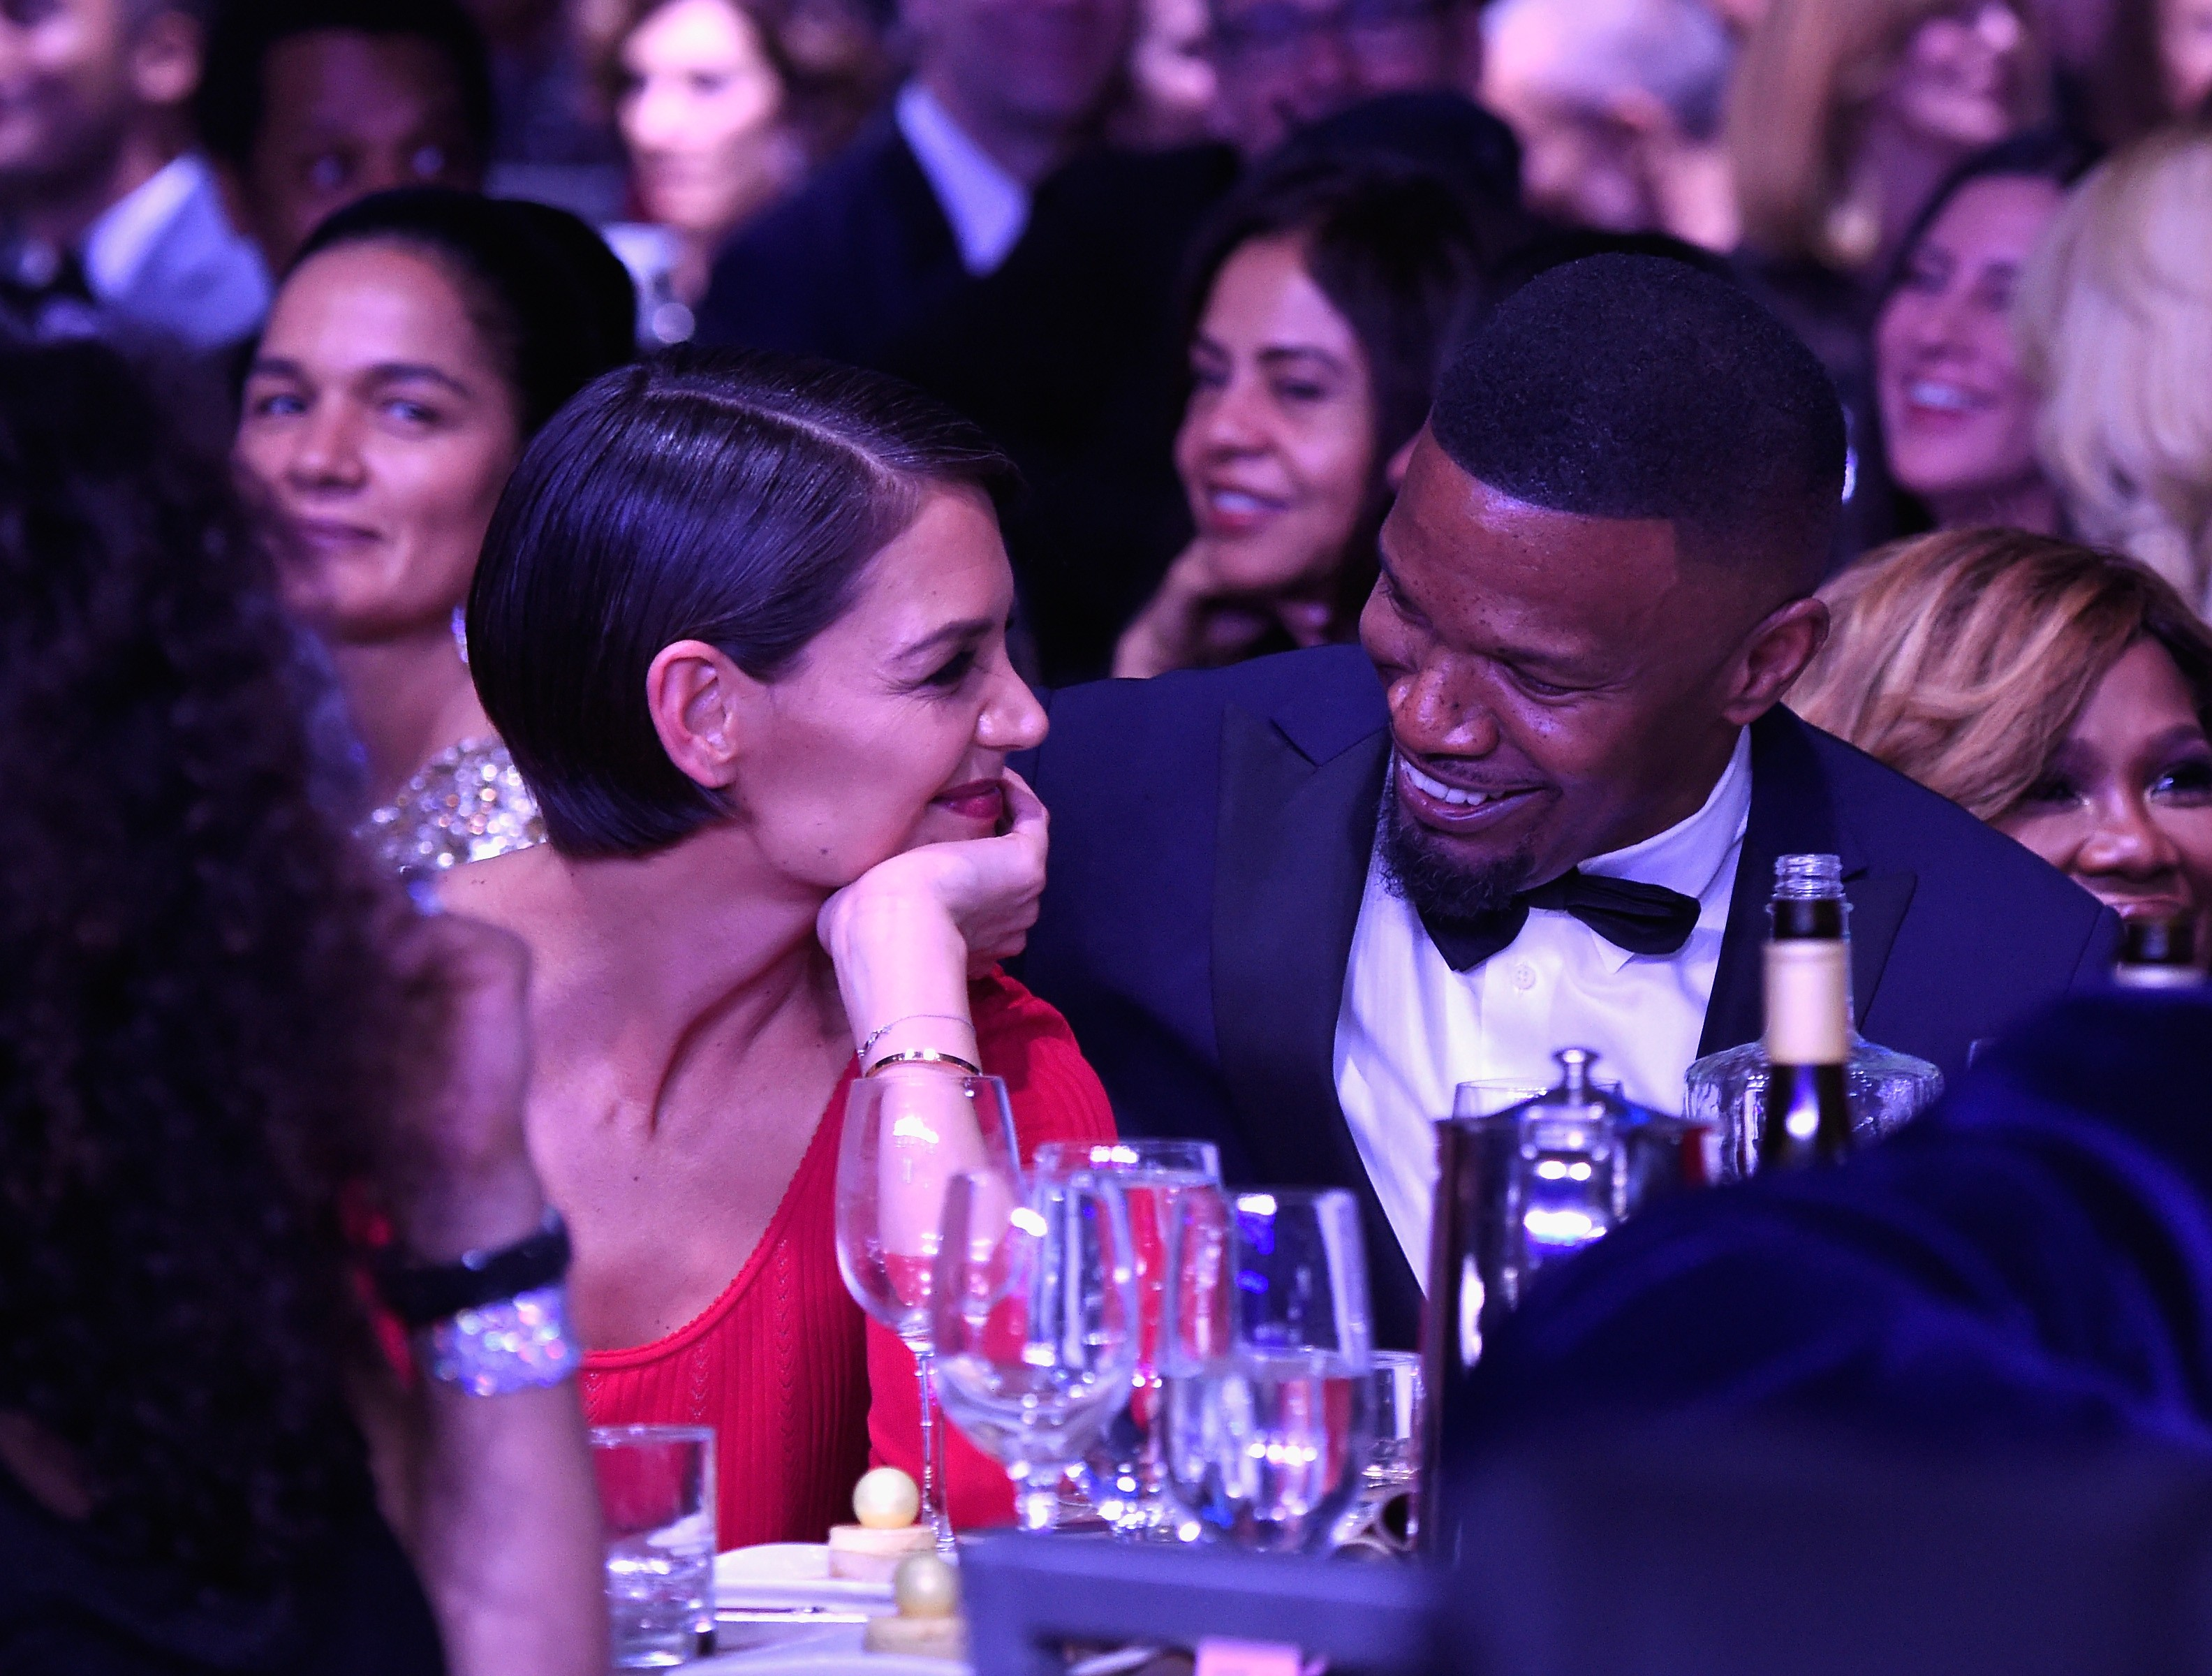 Katie Holmes e Jamie Foxx trocam olhares apaixonados em festa pré-Grammy (Foto: Getty Images)